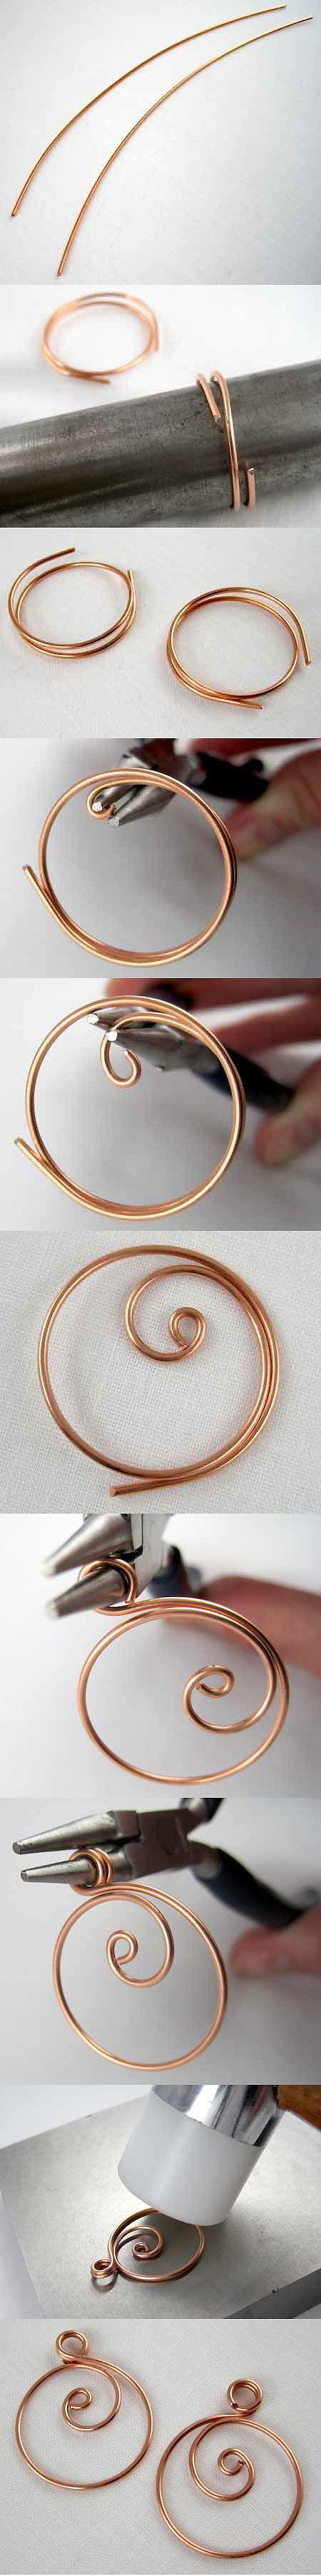 I like these:)